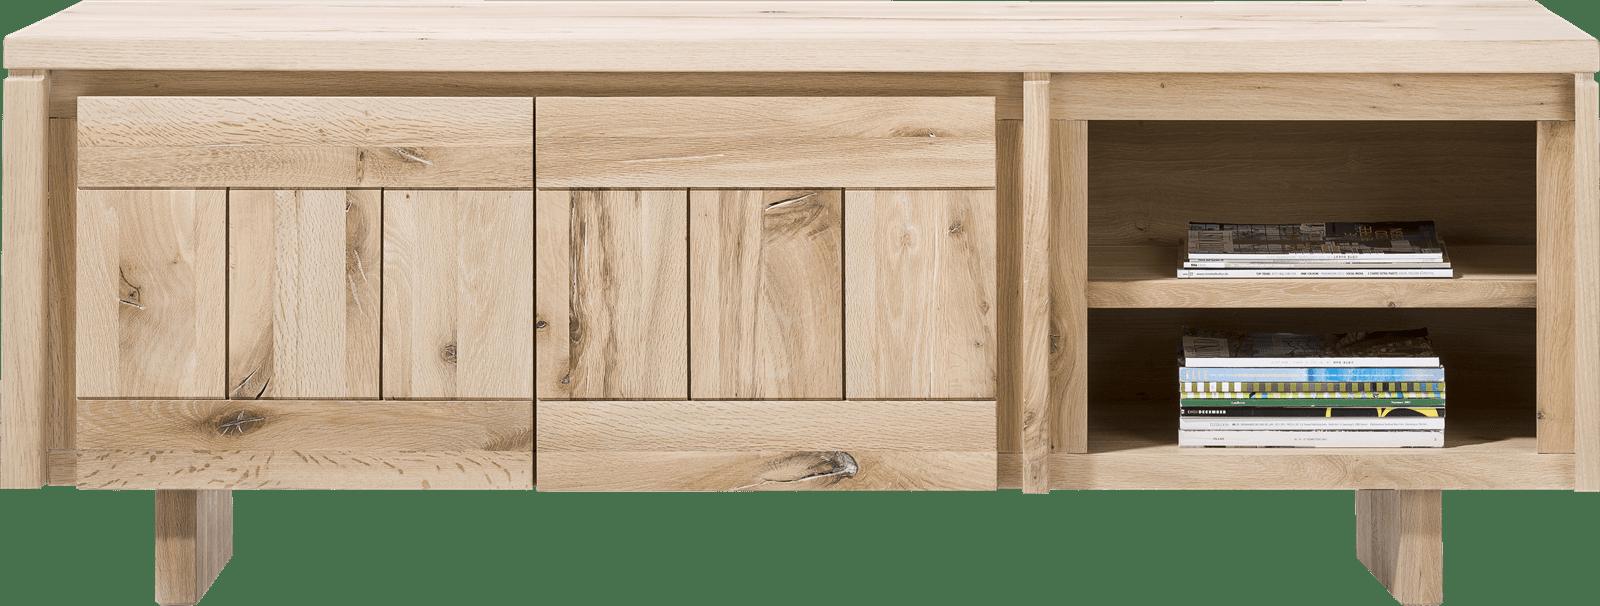 More - lowboard 180 cm - 2-deuren + 2-niches - hout